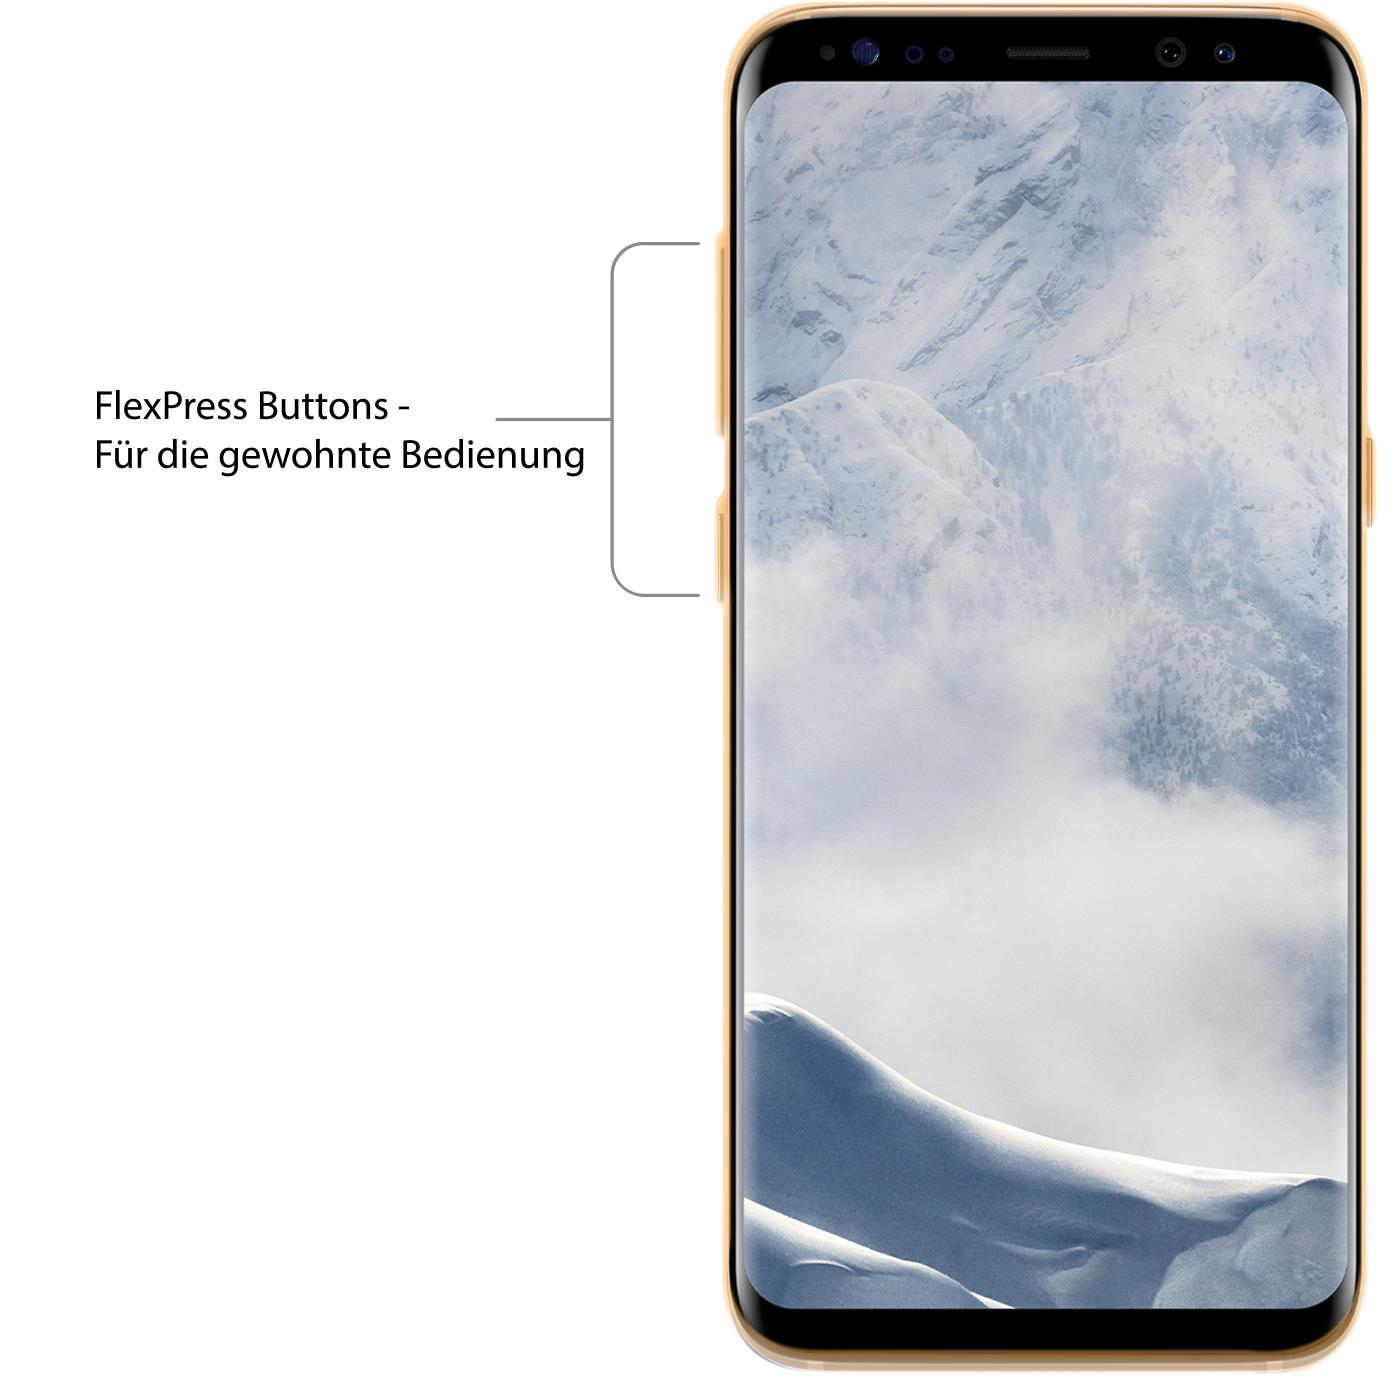 Samsung-Galaxy-s8-Duenn-Silikon-Klar-Case-Cover-Ultra-Slim-Stossfeste-Gel-Rueckseite Indexbild 18